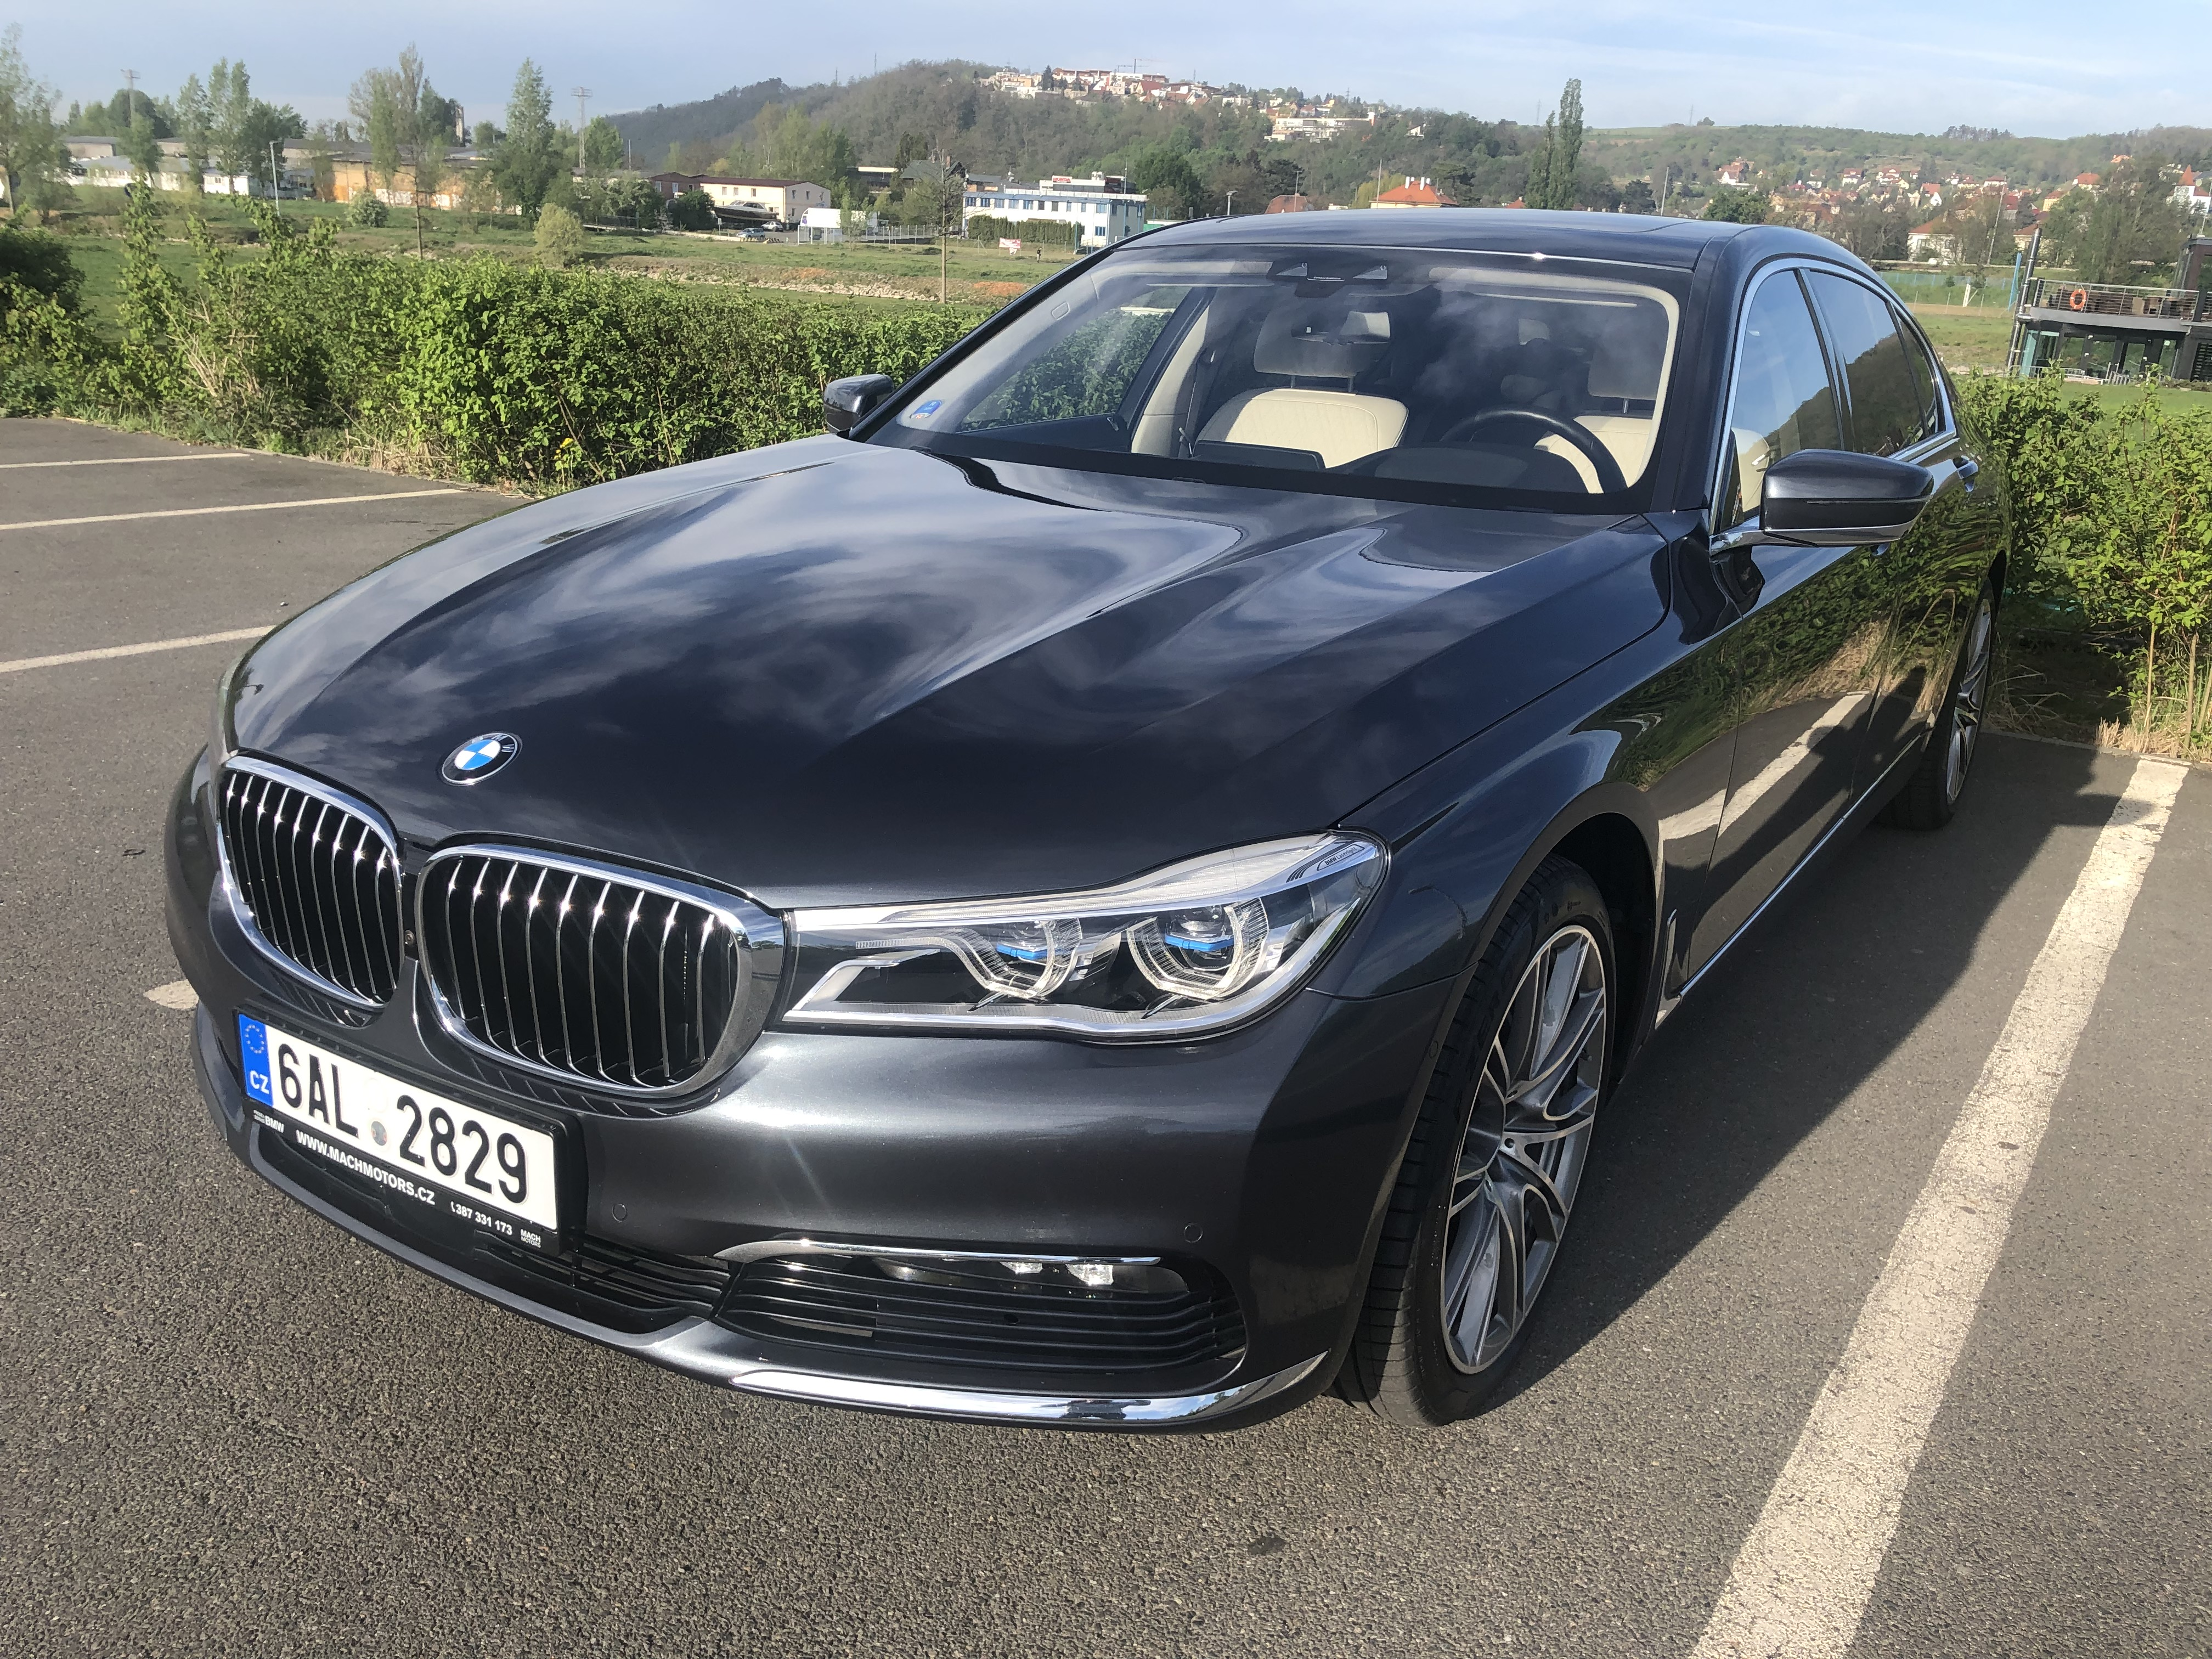 Obrázek: BMW 750Li xDrive